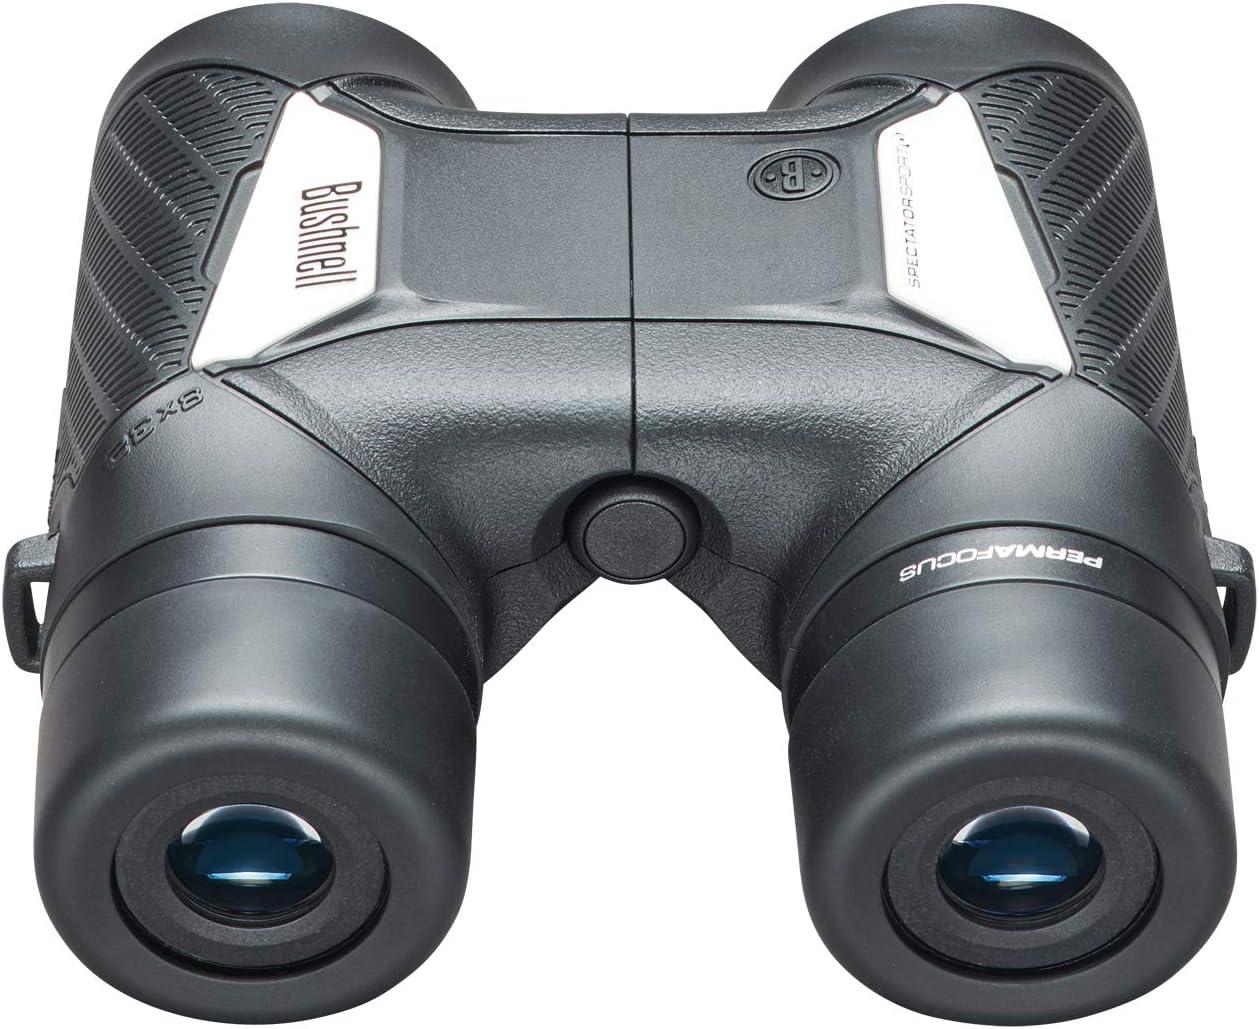 Bushnell Fernglas 8x32 Spectator Sport Kompakt Kamera